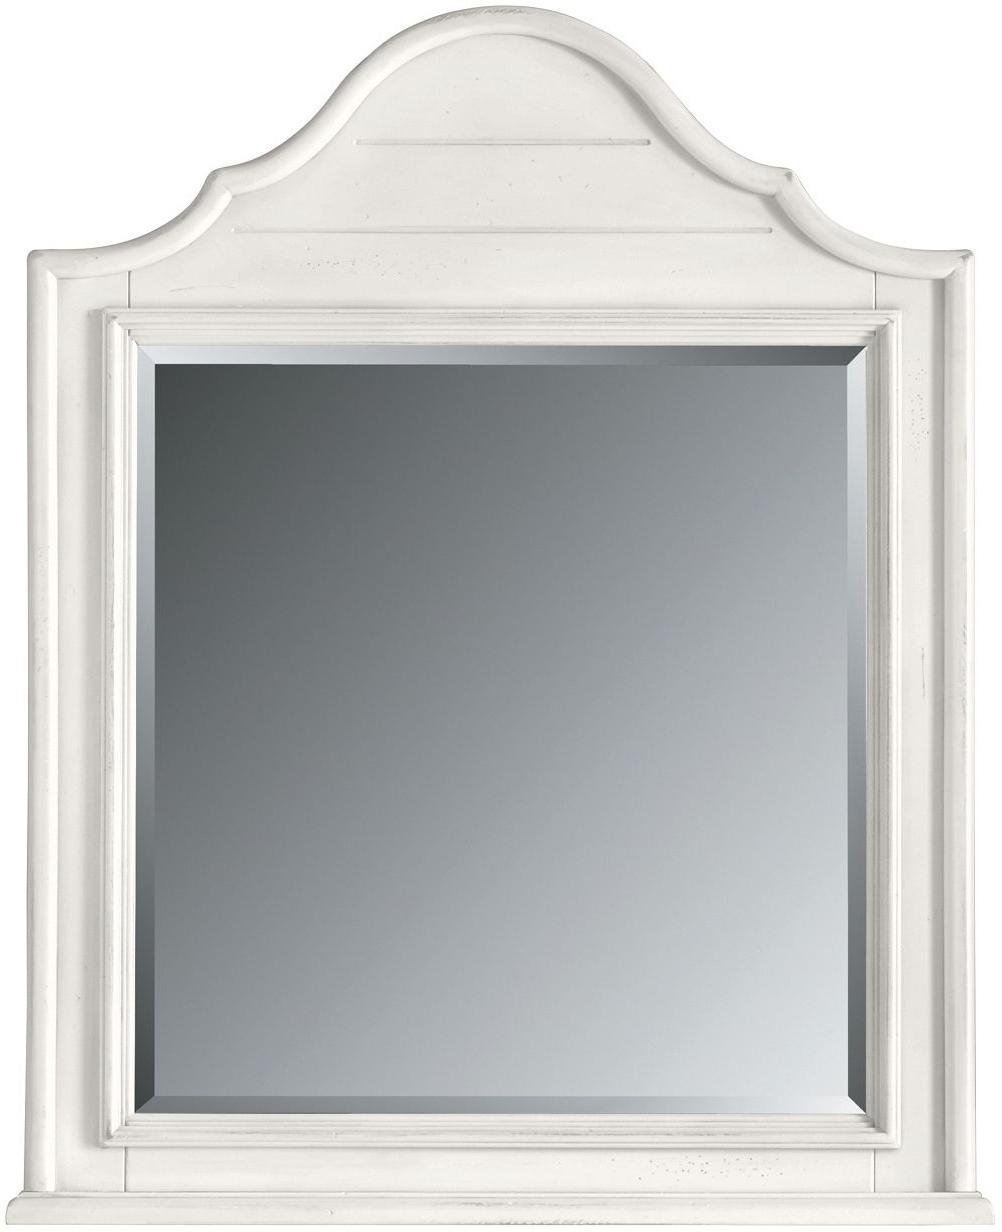 Stanley Furniture Coastal Living Retreat Arch Top Mirror - Item Number: 411-23-31